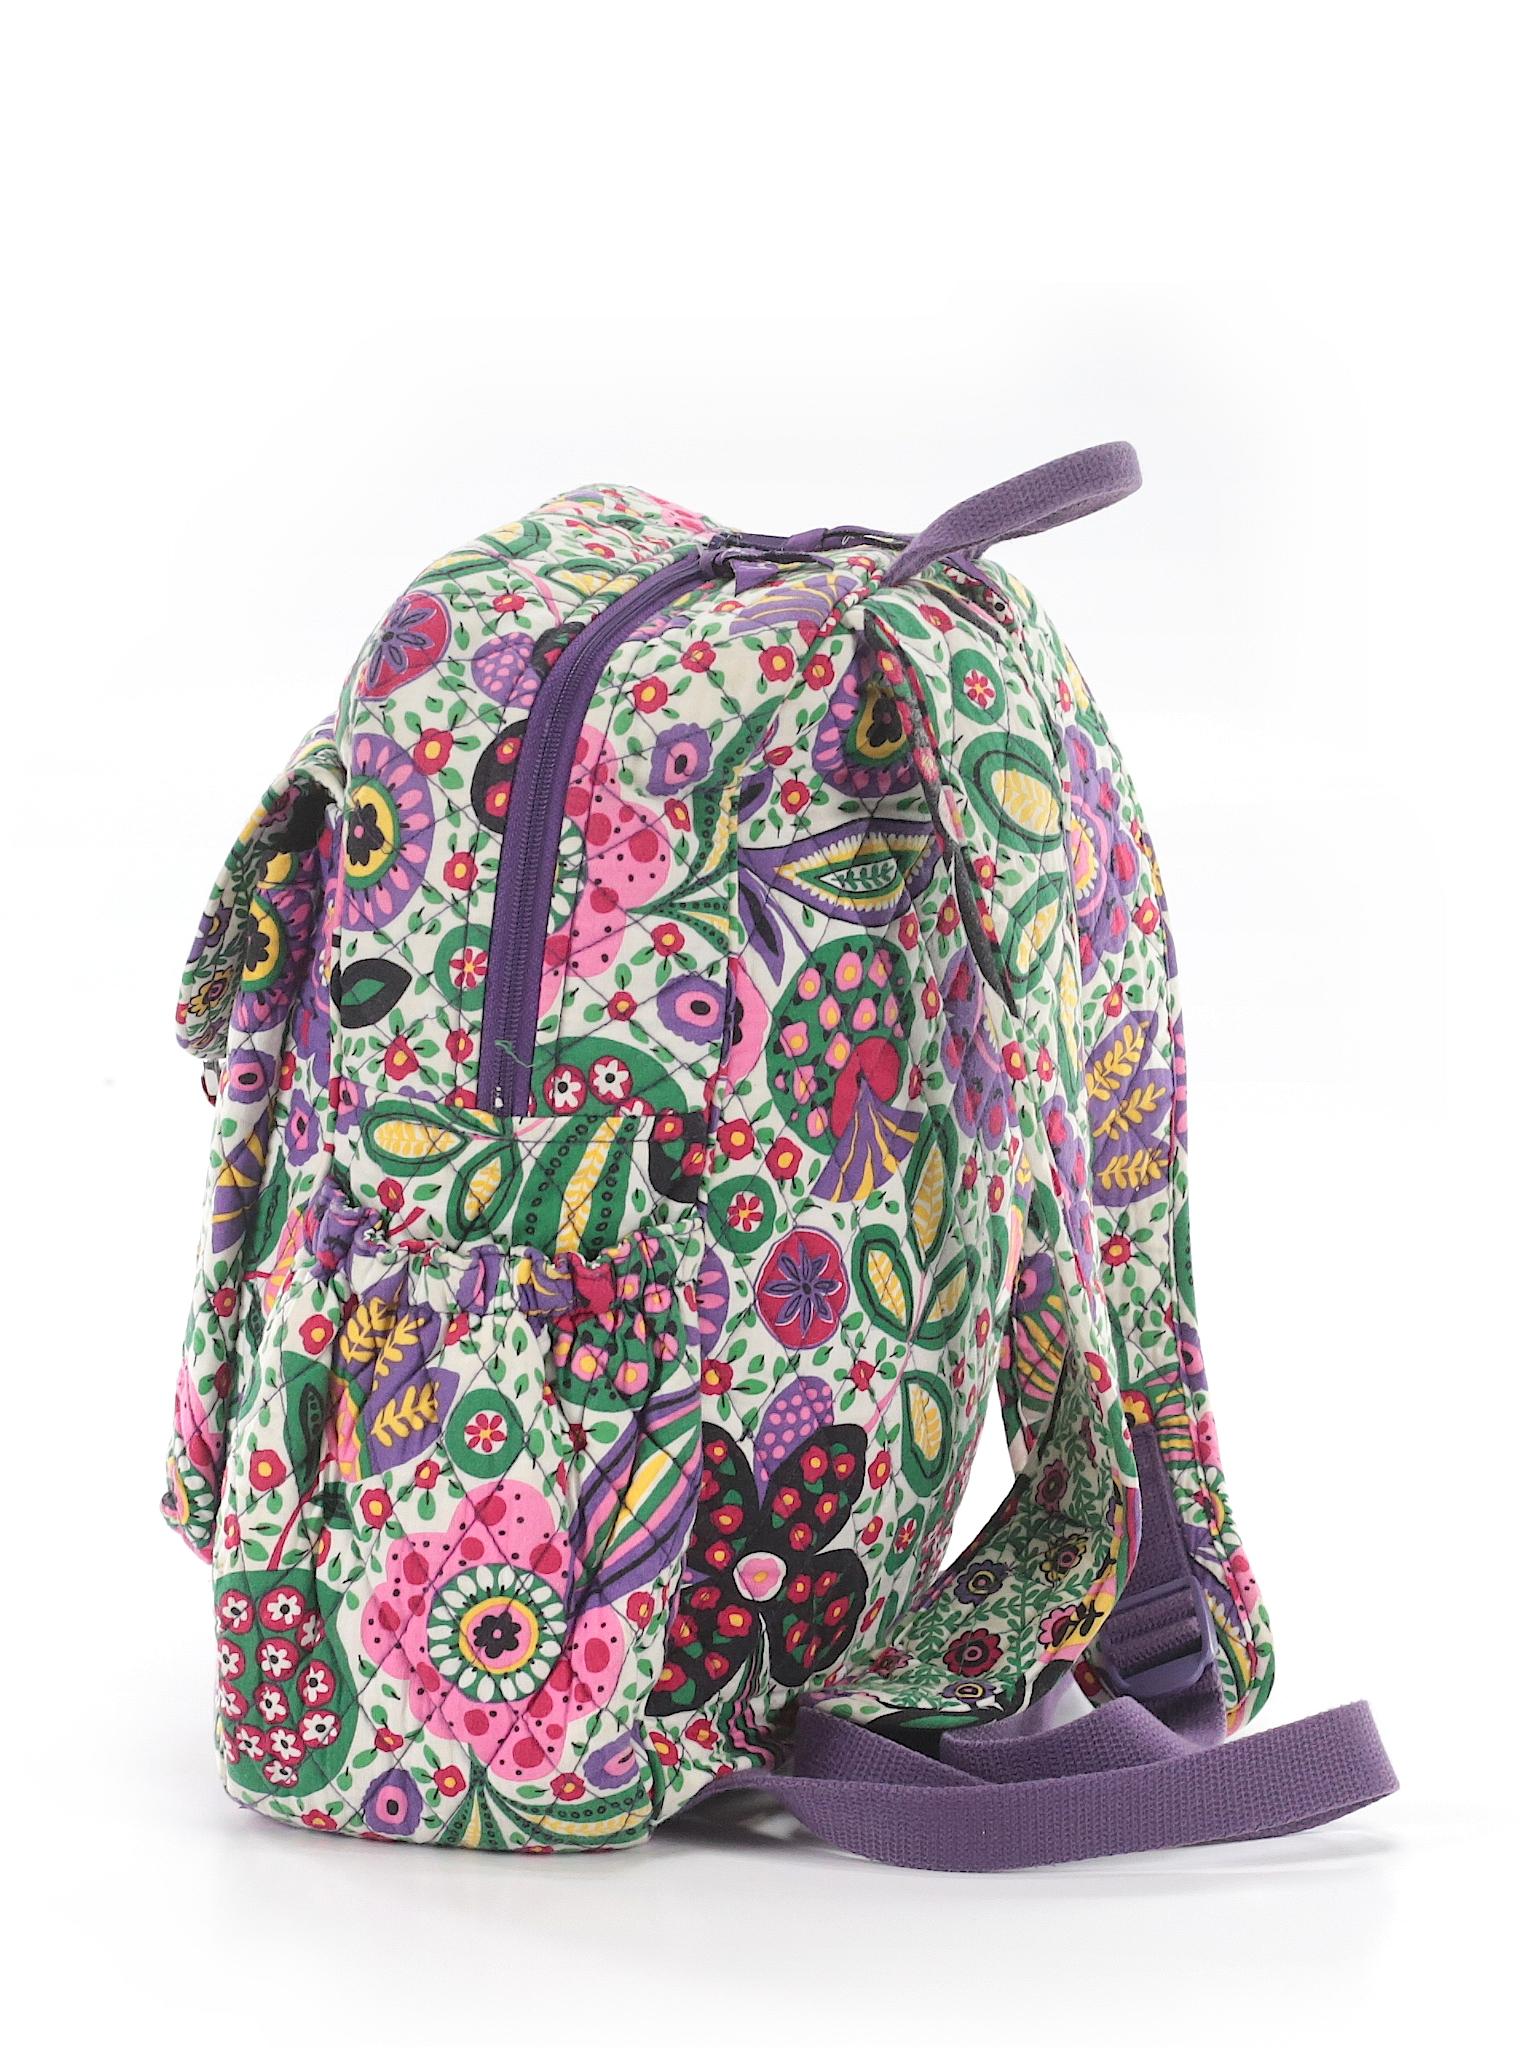 23d691b71342 Vera Bradley 100% Cotton Print Purple Backpack One Size - 61% off ...